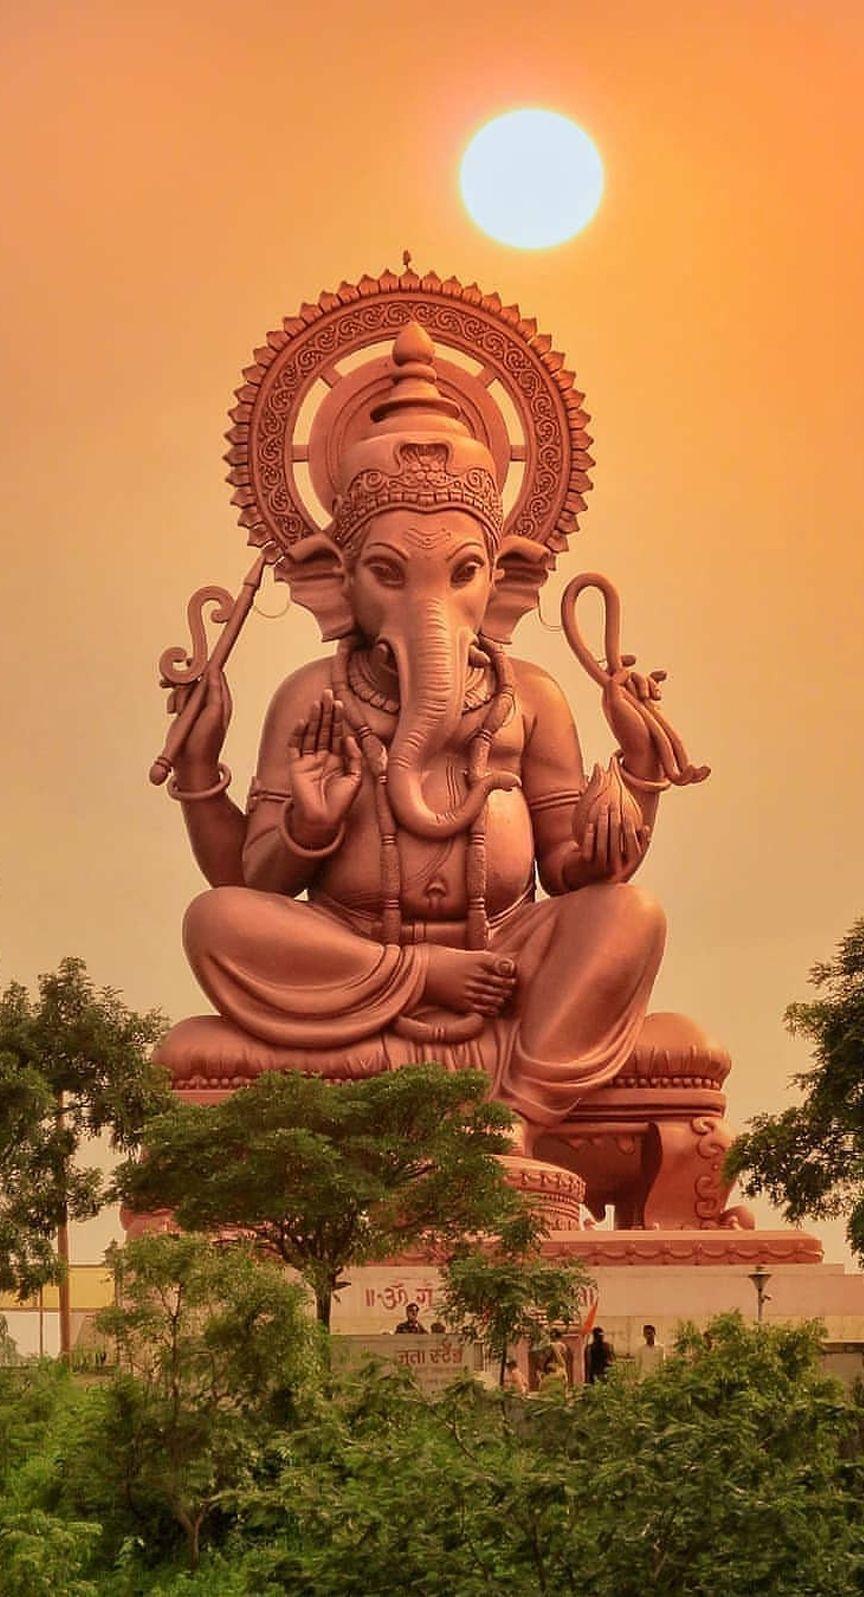 Lord Ganesha Statue Sunset Mobile Wallpaper Indian God Lord Ganesha Paintings Ganesha Pictures Ganpati Bappa Wallpapers